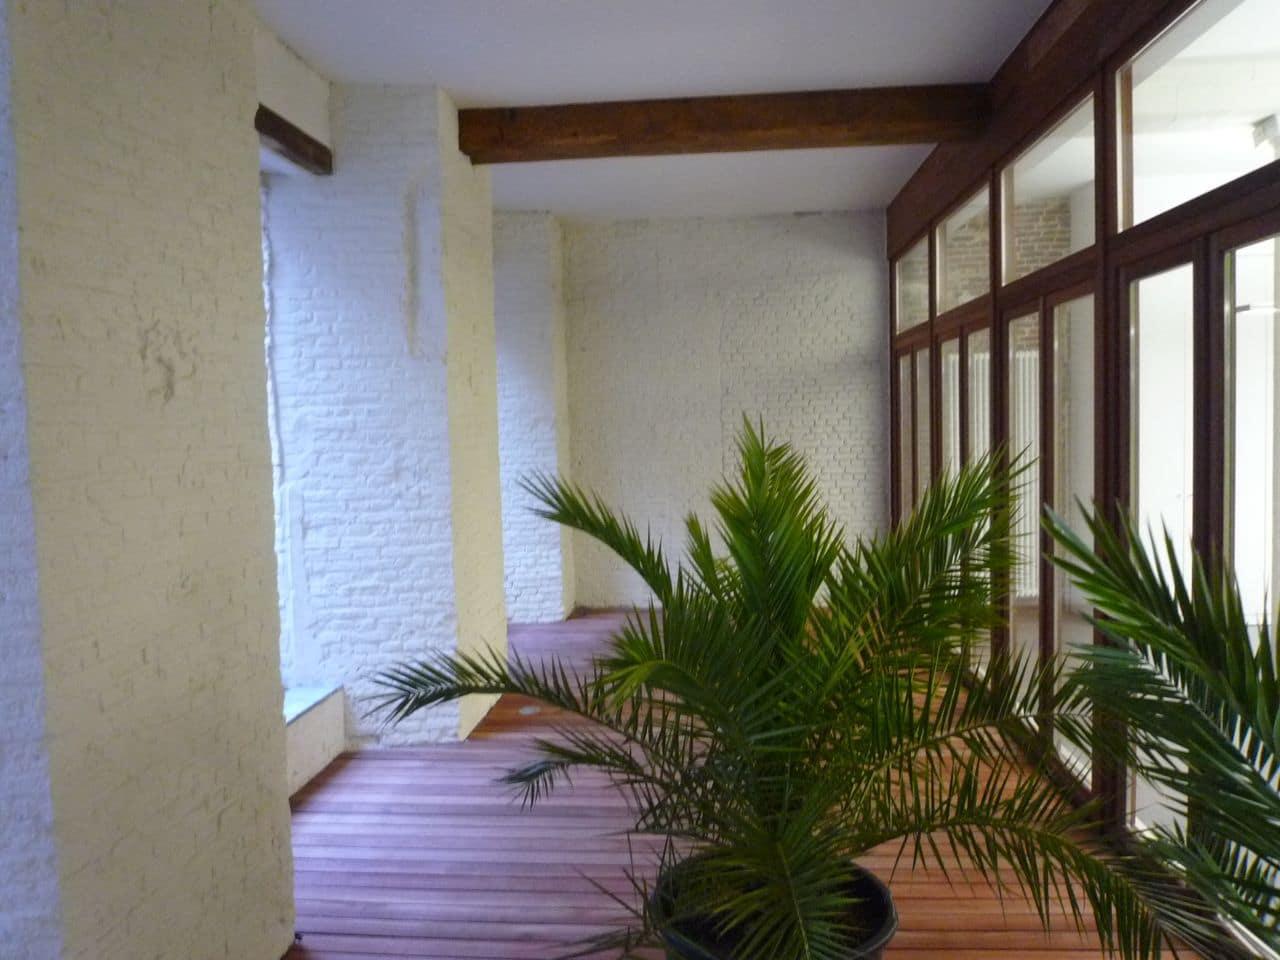 P1060708 | Baeyens & Beck architecten Gent | architect nieuwbouw renovatie interieur | high end | architectenbureau